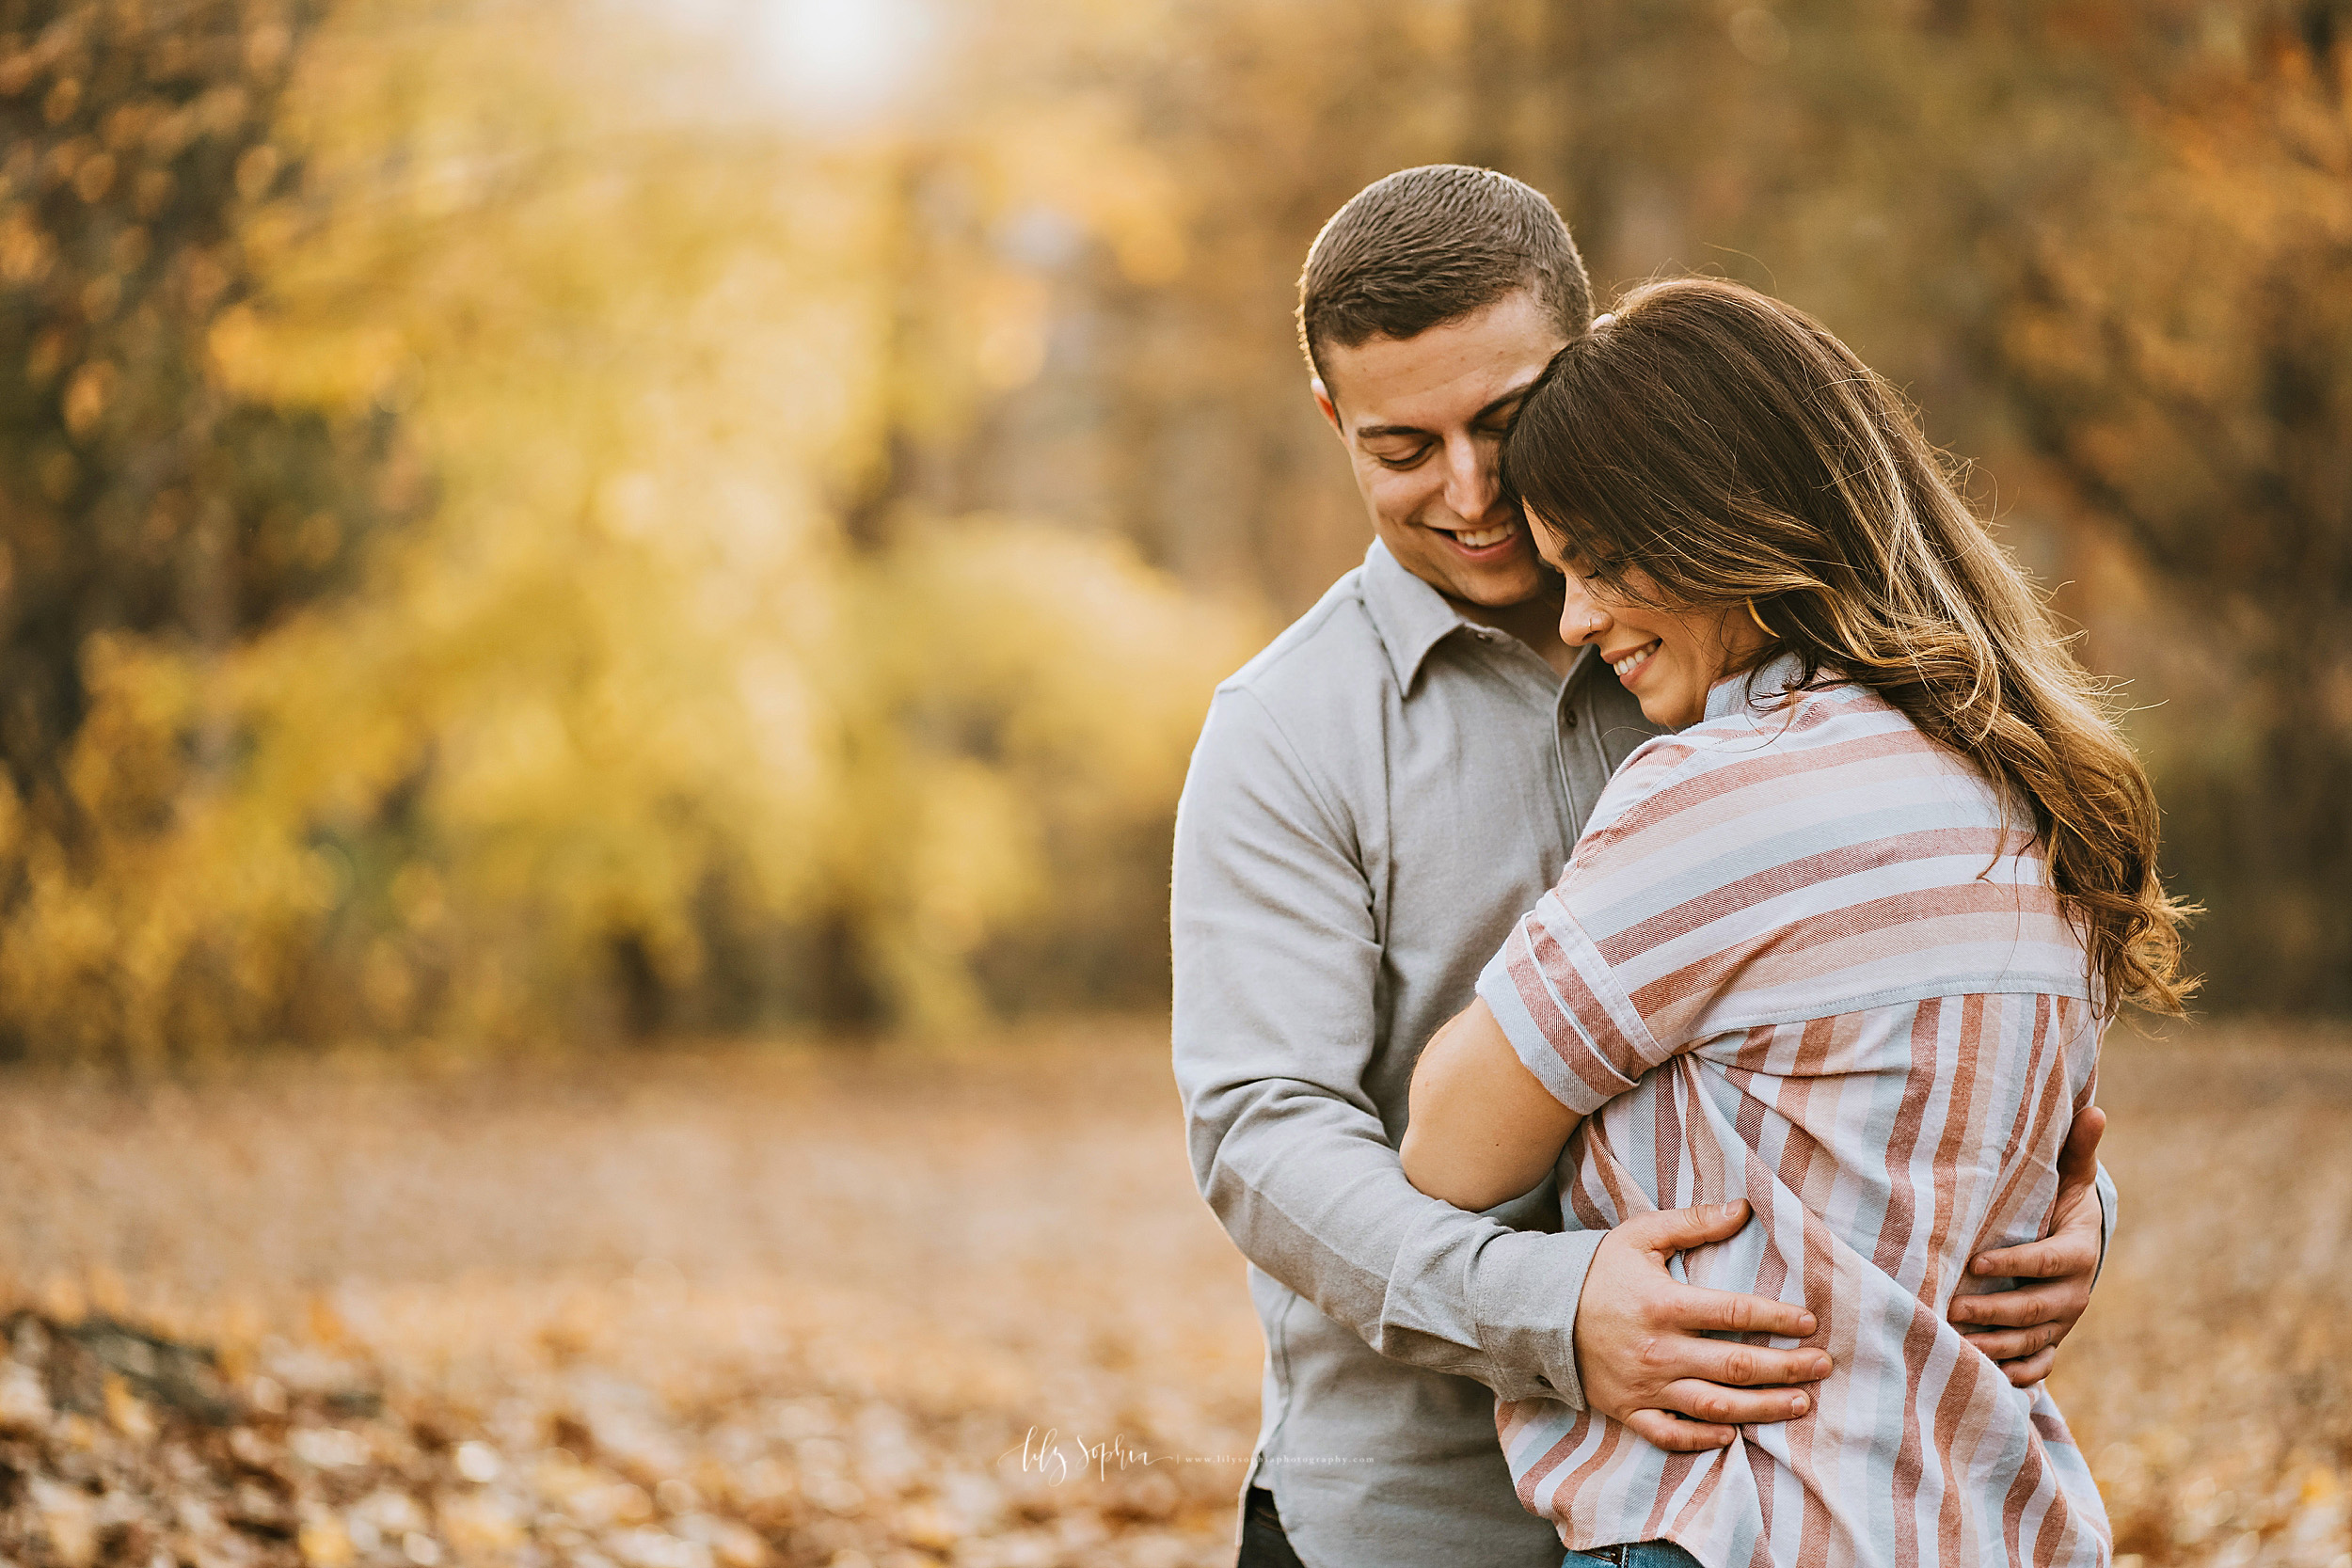 atlanta-reynoldstown-peoplestown-decatur-sandy-springs-buckhead-virginia-highlands-west-end-decatur-lily-sophia-photography-outdoor-fall-couples-photos_1482.jpg